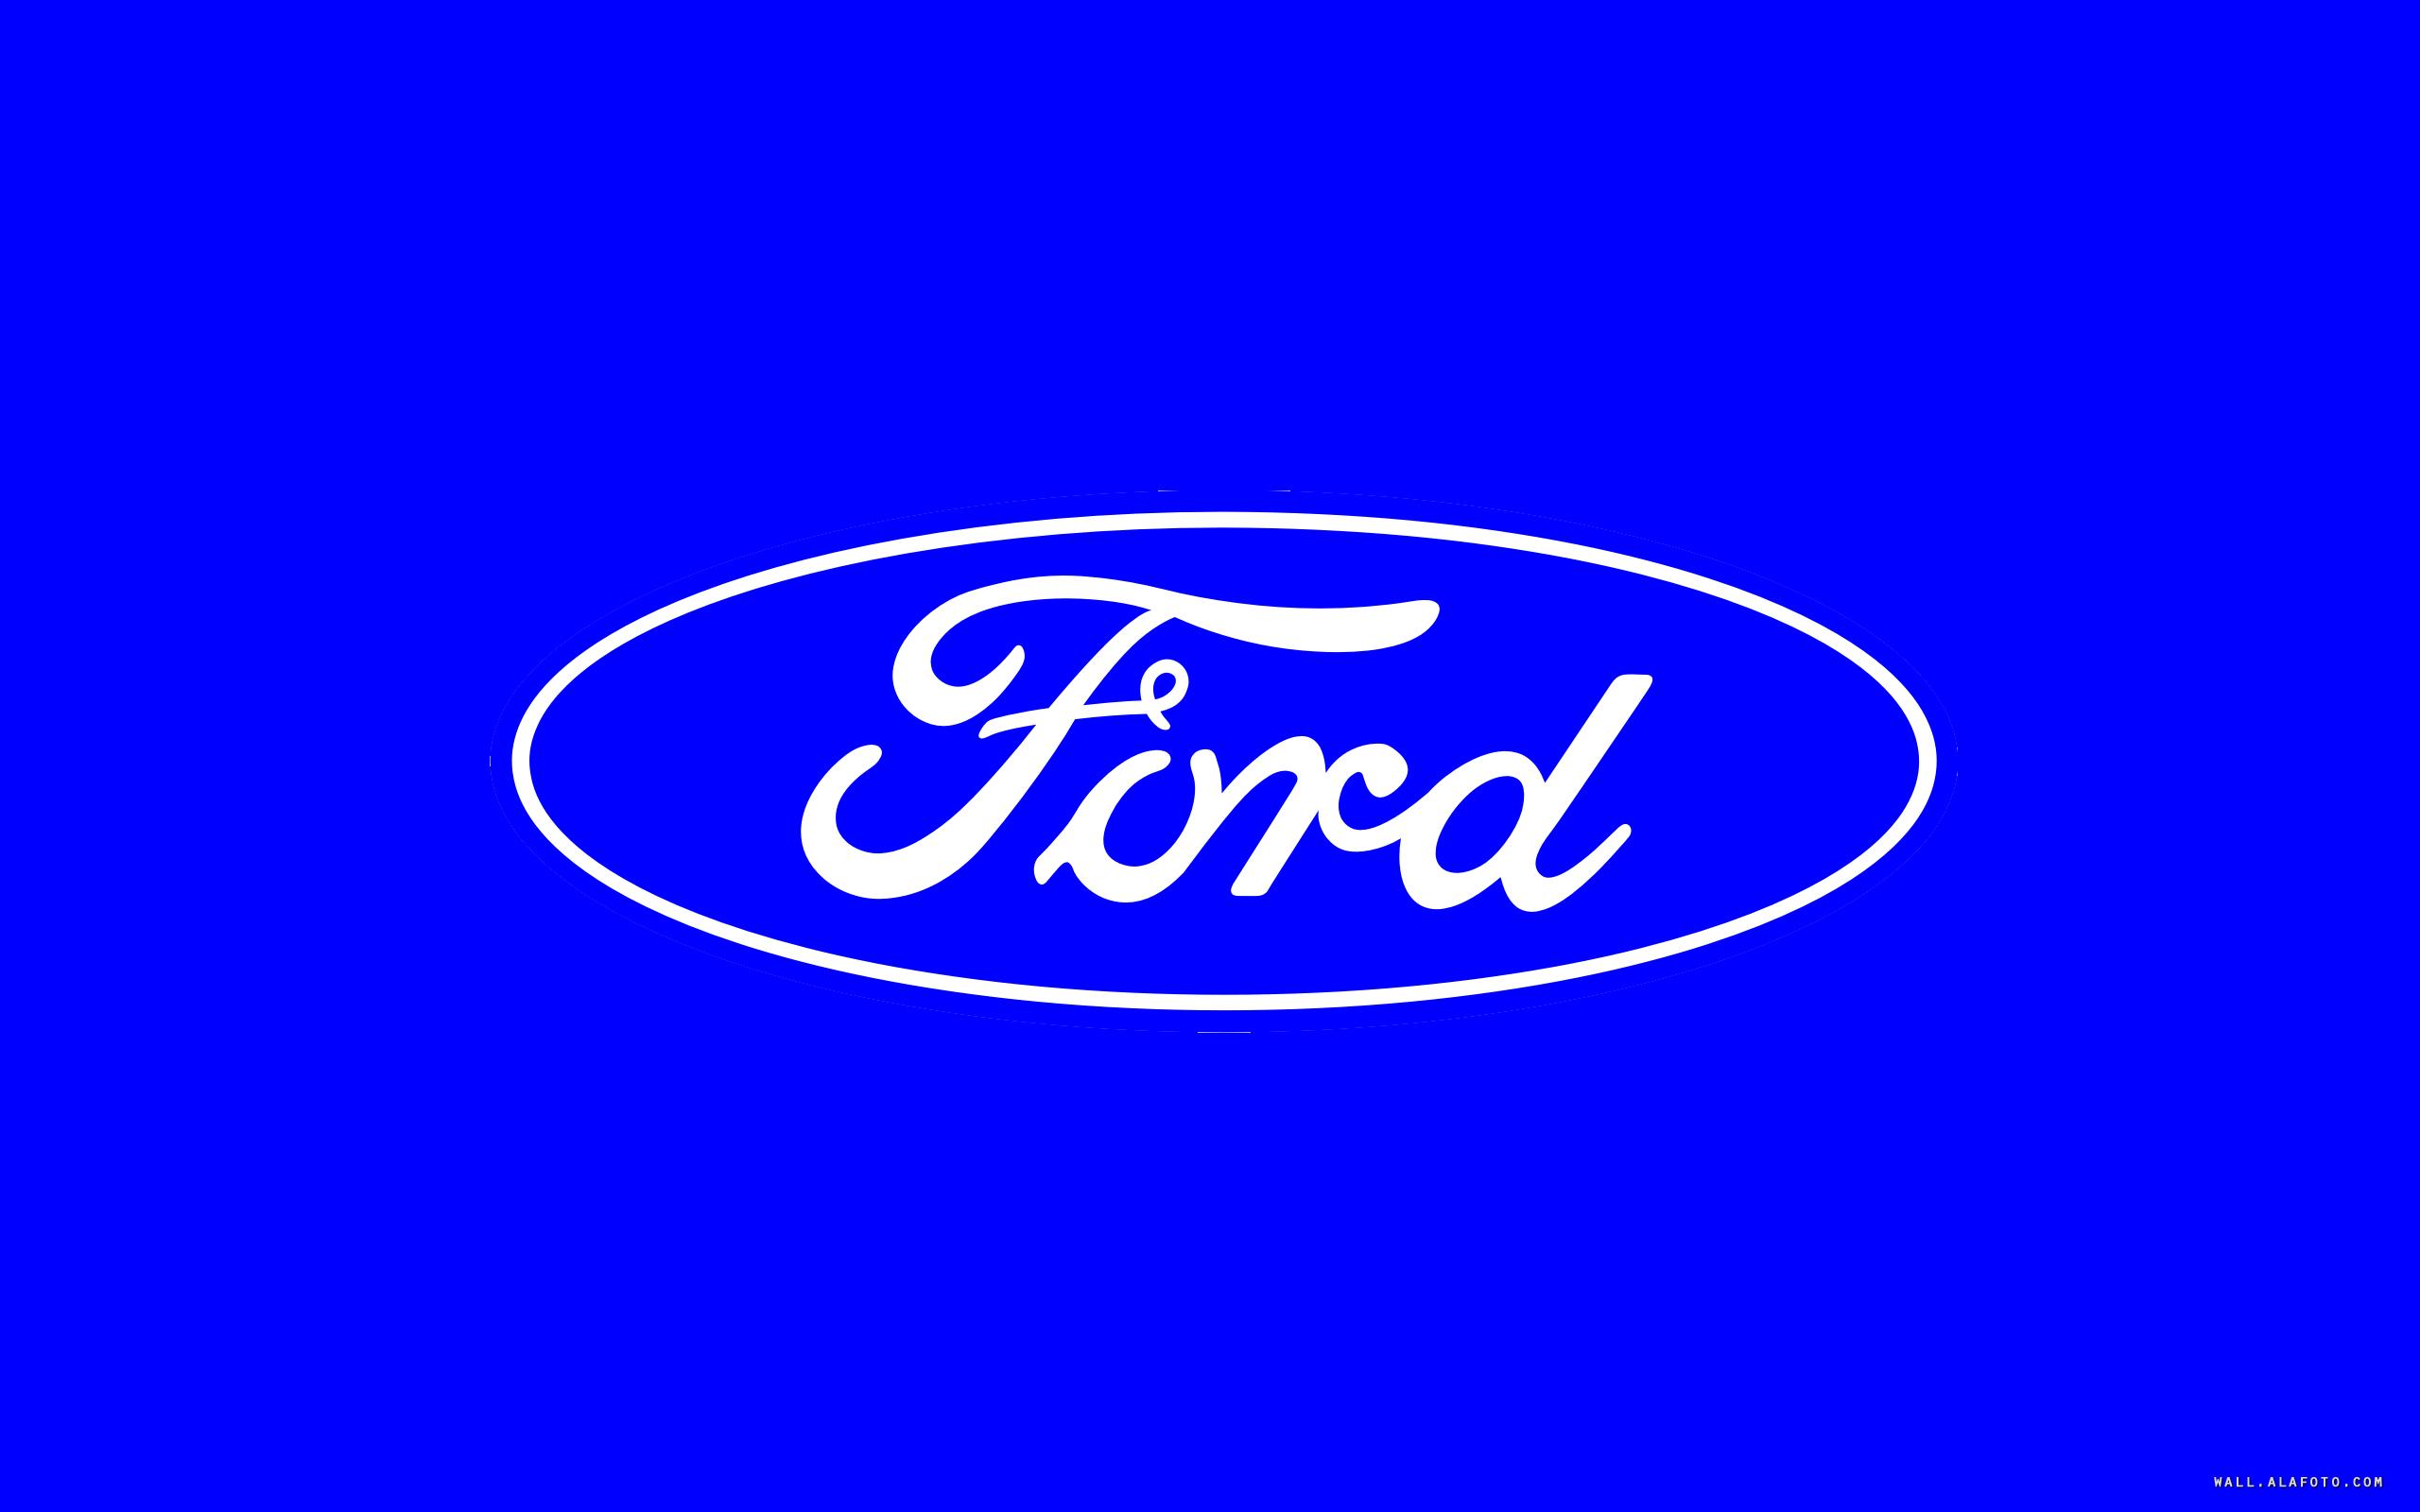 Ford Cars Logos   Ford logo 101   Alafoto Wallpapers 2560x1600